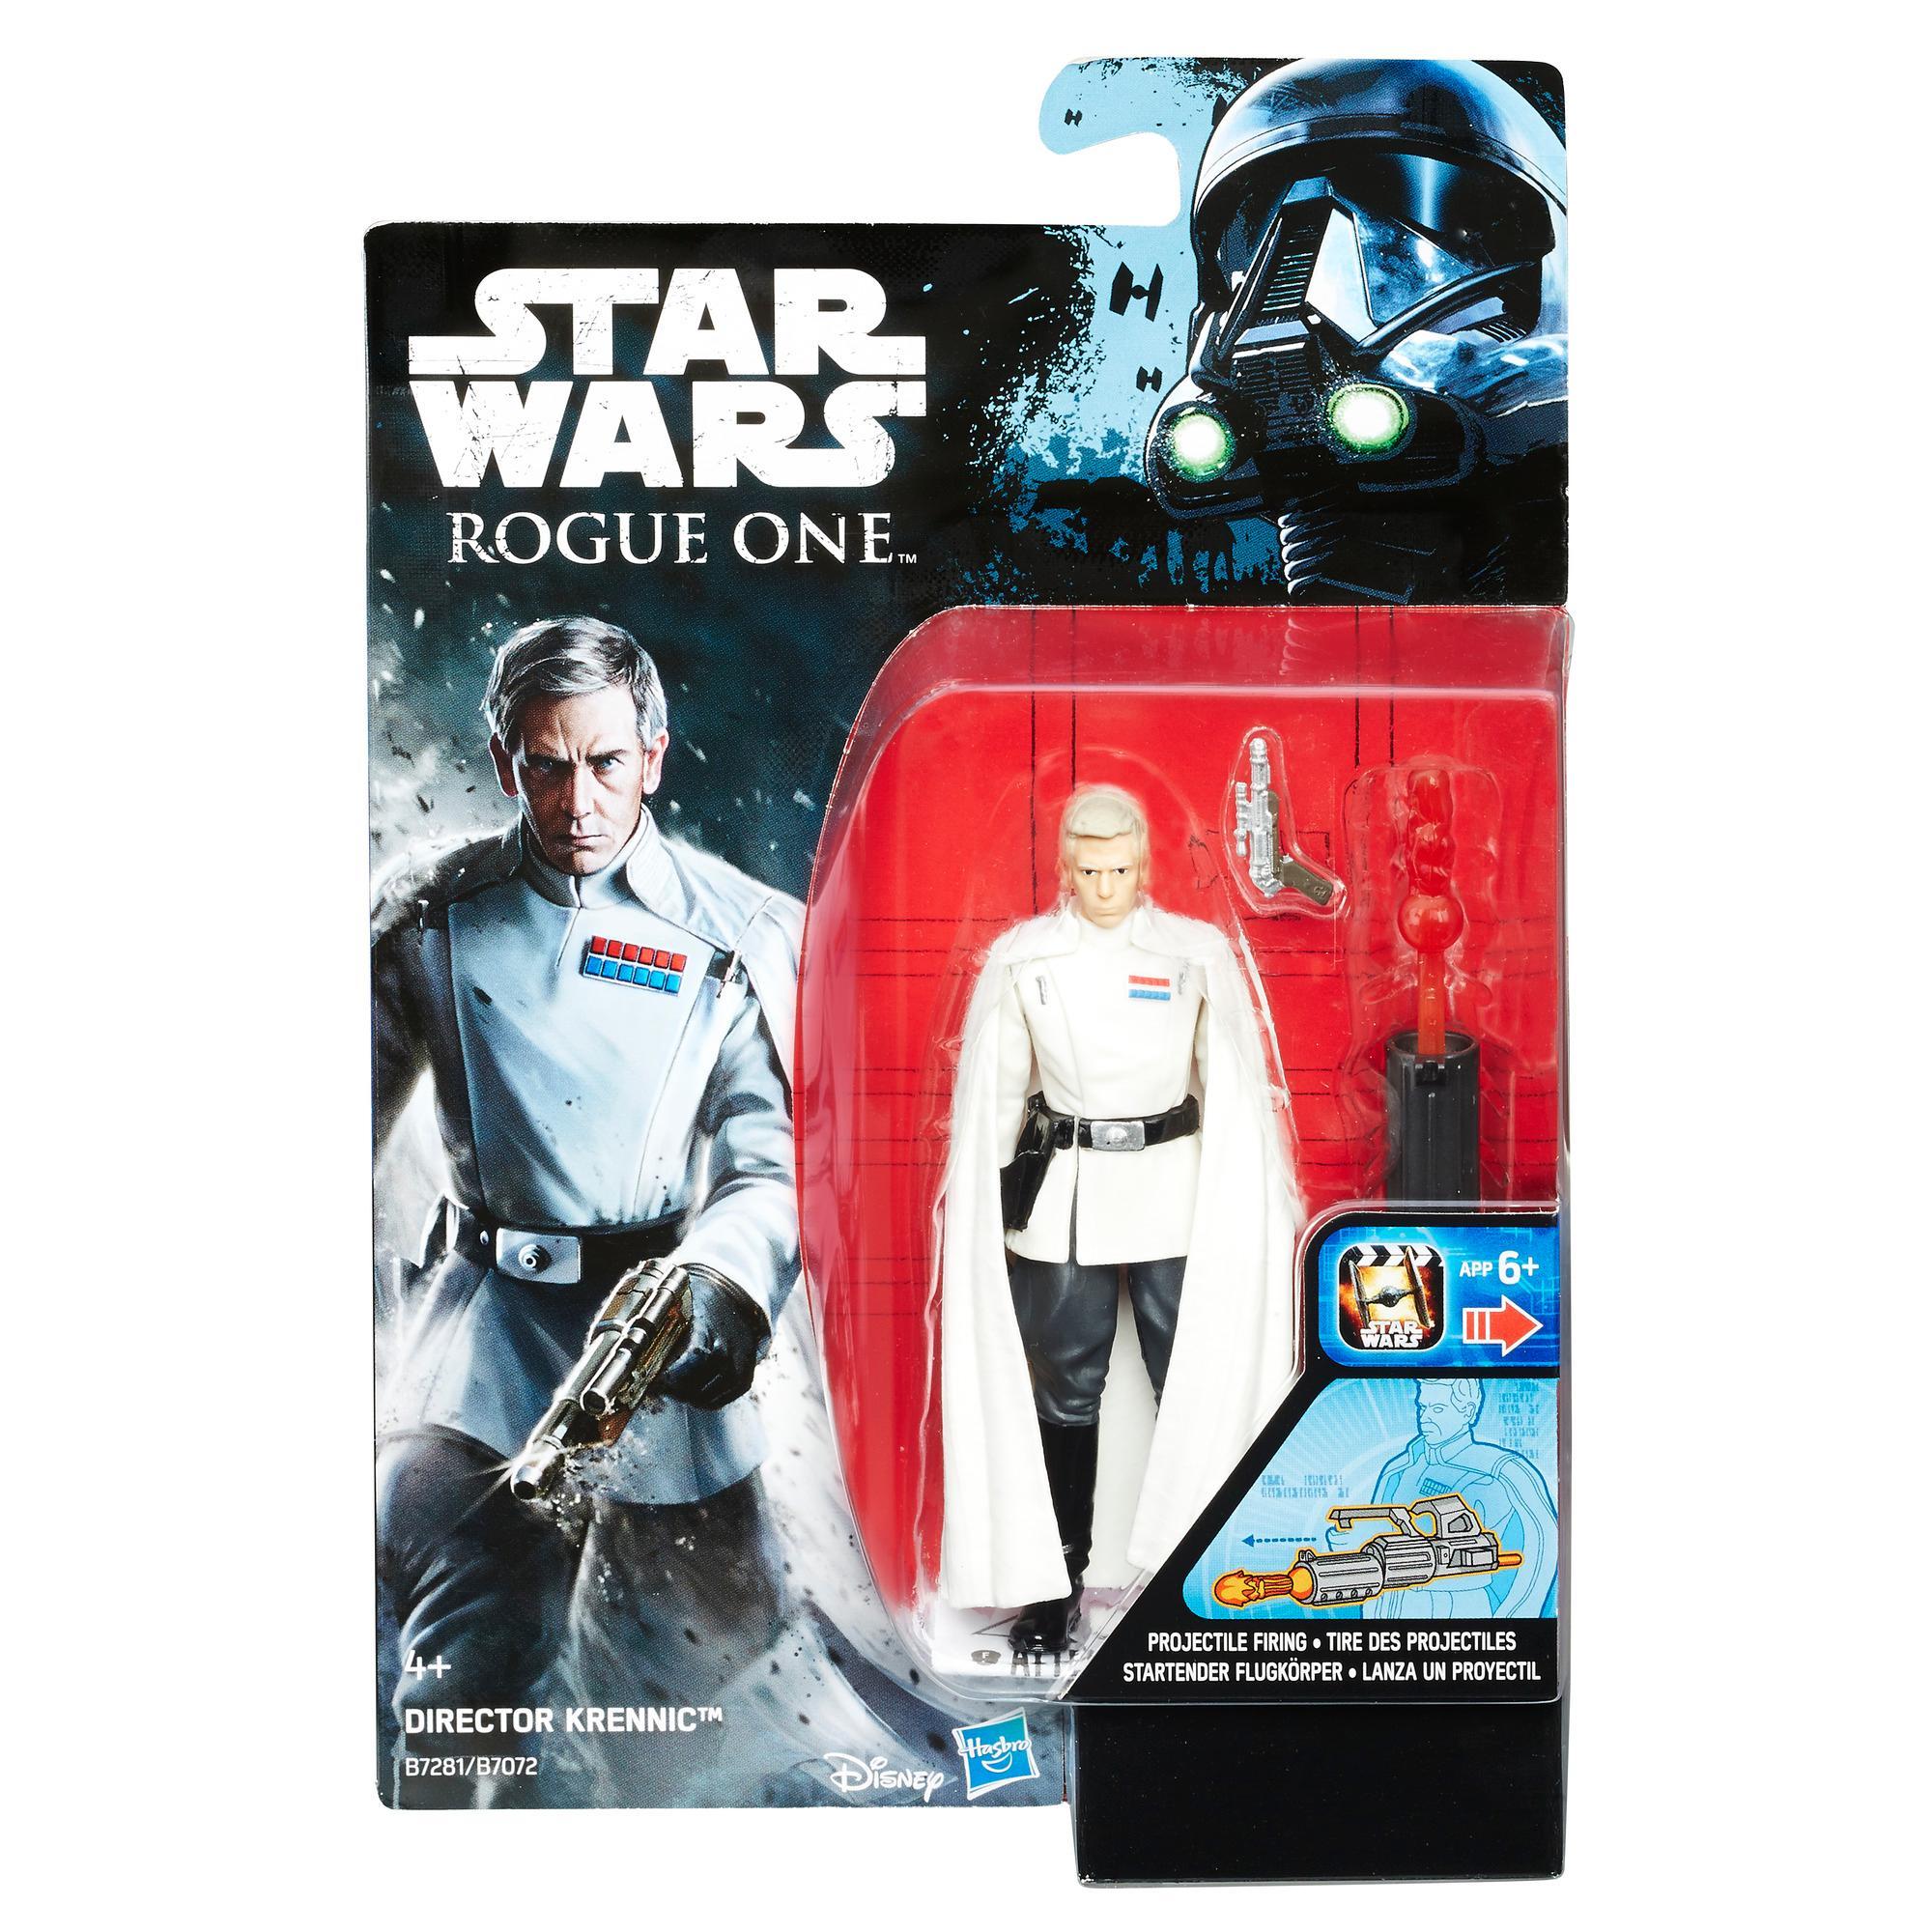 Star Wars Rogue One Director Krennic Figure